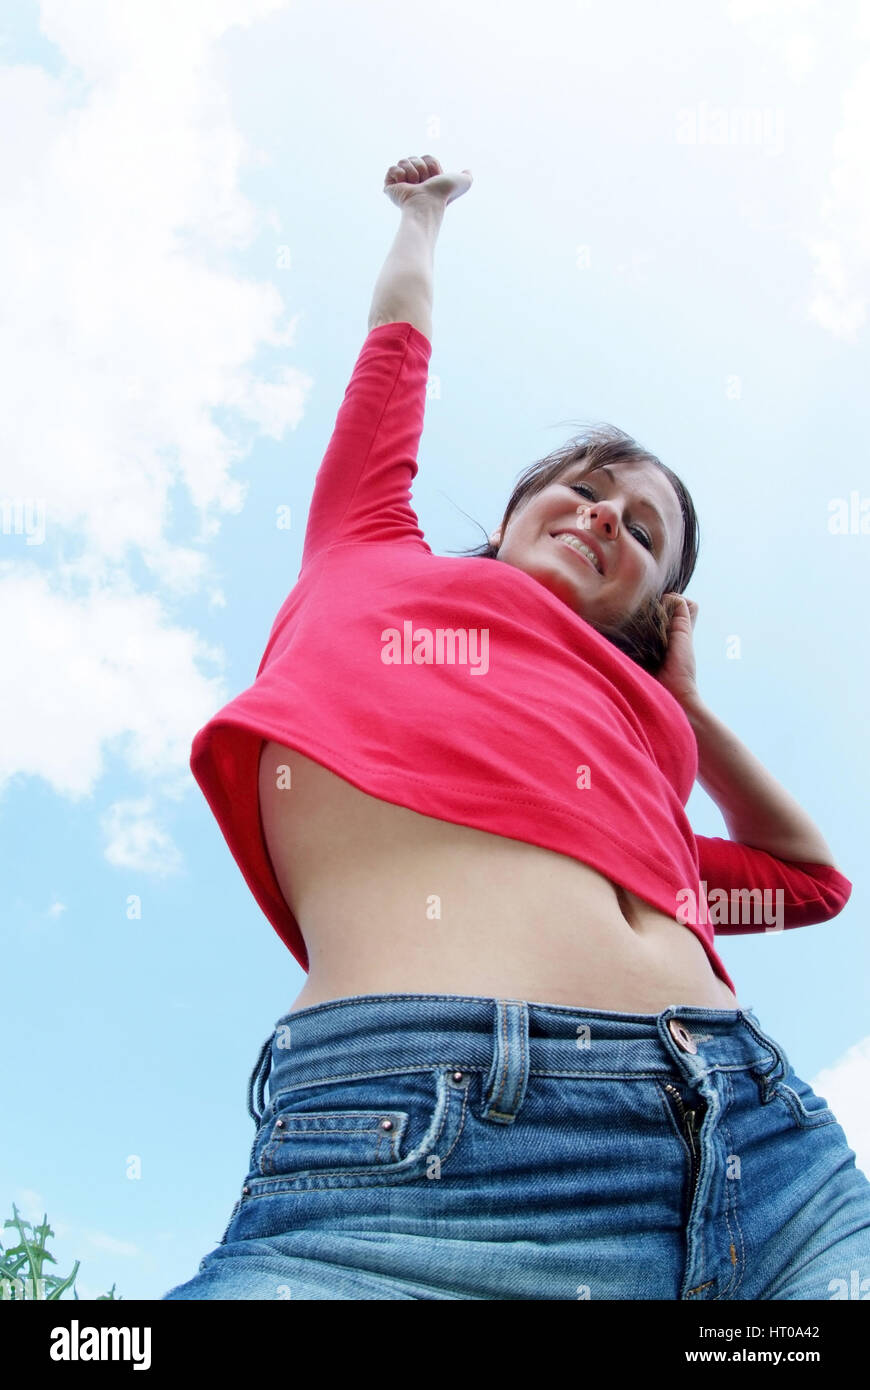 Junge Frau voll Lebensfreude - young woman full of life - Stock Image